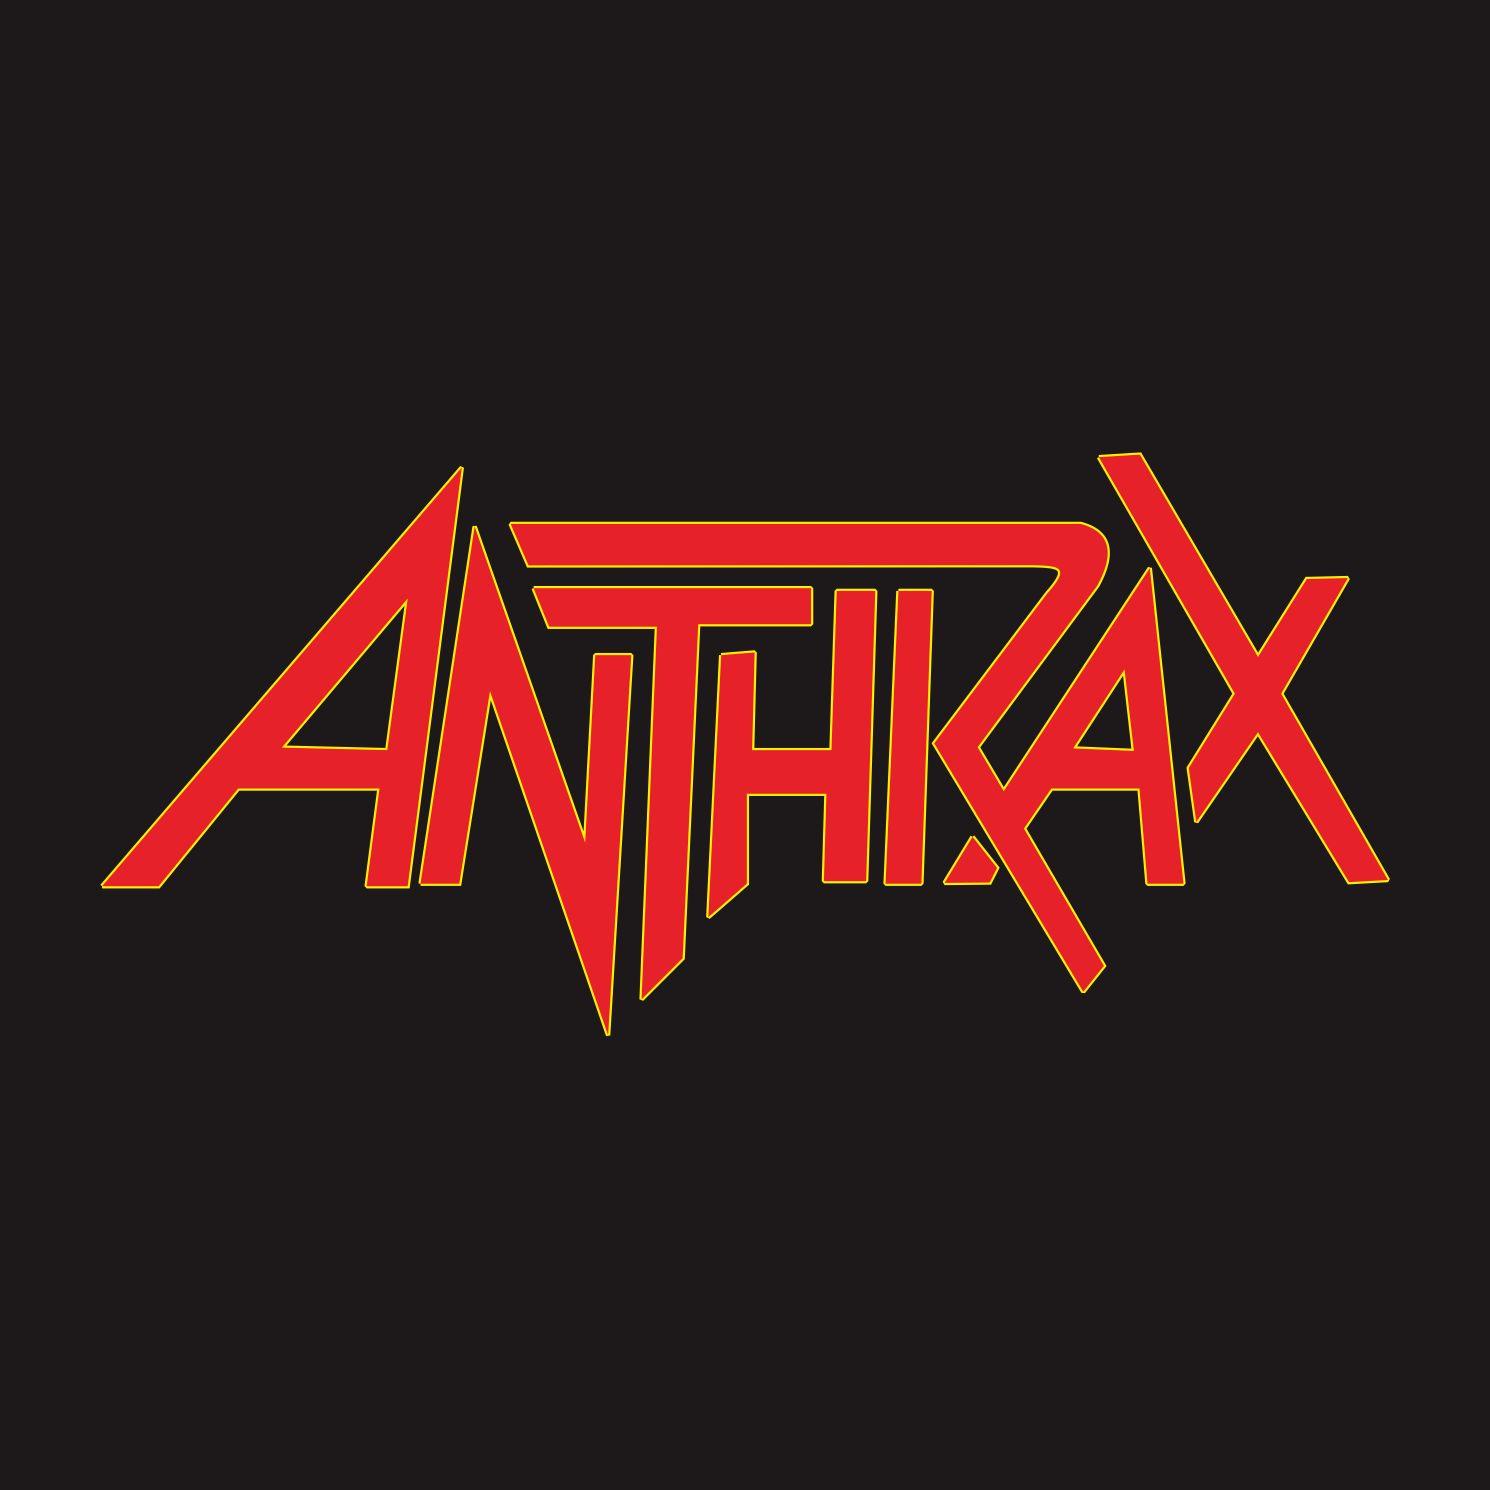 logo anthrax vector